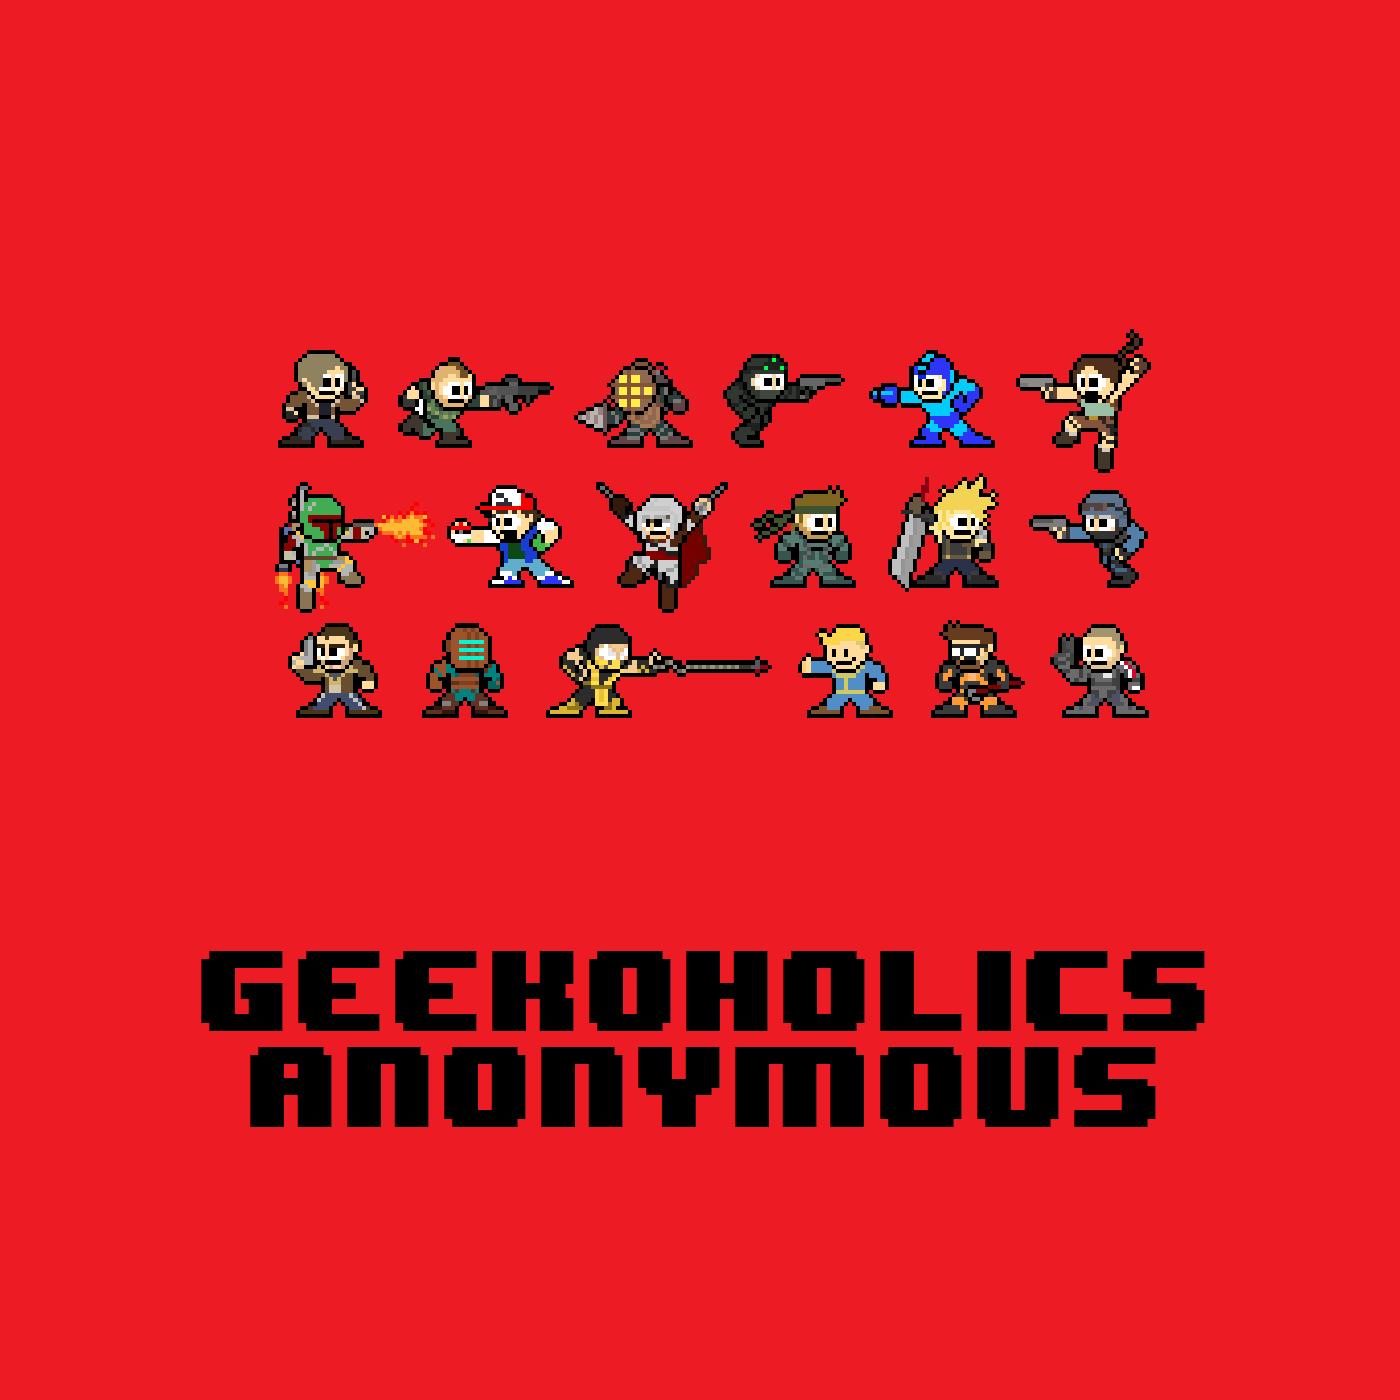 Geekoholics Anonymous: Video Games, Movies, Comics, TV, Tech and Toys logo